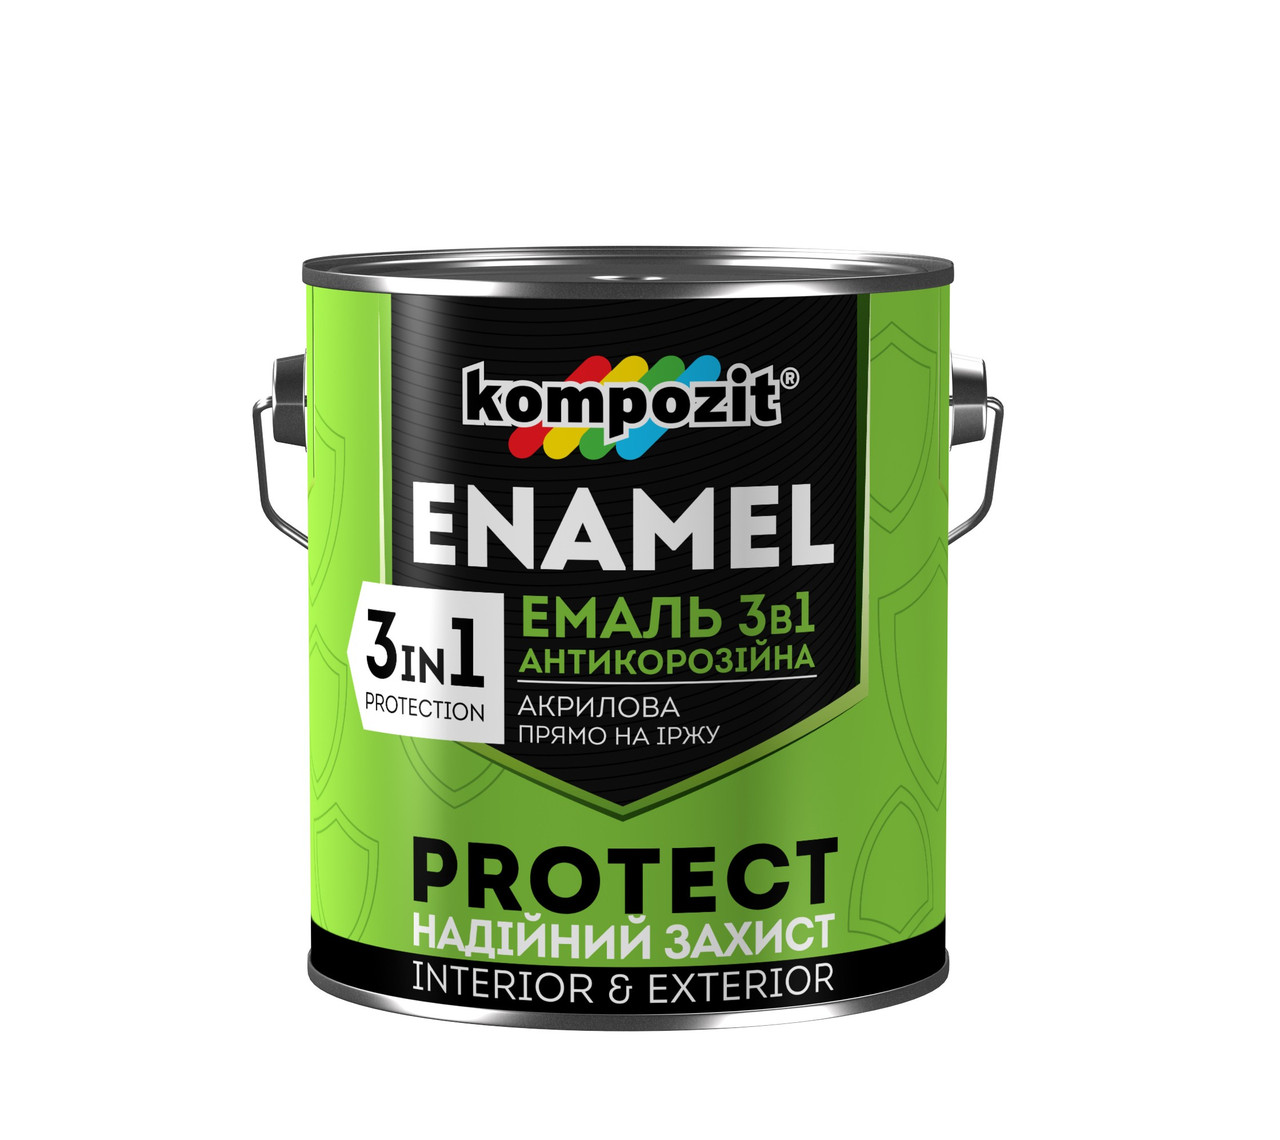 Емаль 3 в 1 антикорозійна Protect КОМПОЗИТ жовта 0,75 кг   /8шт/